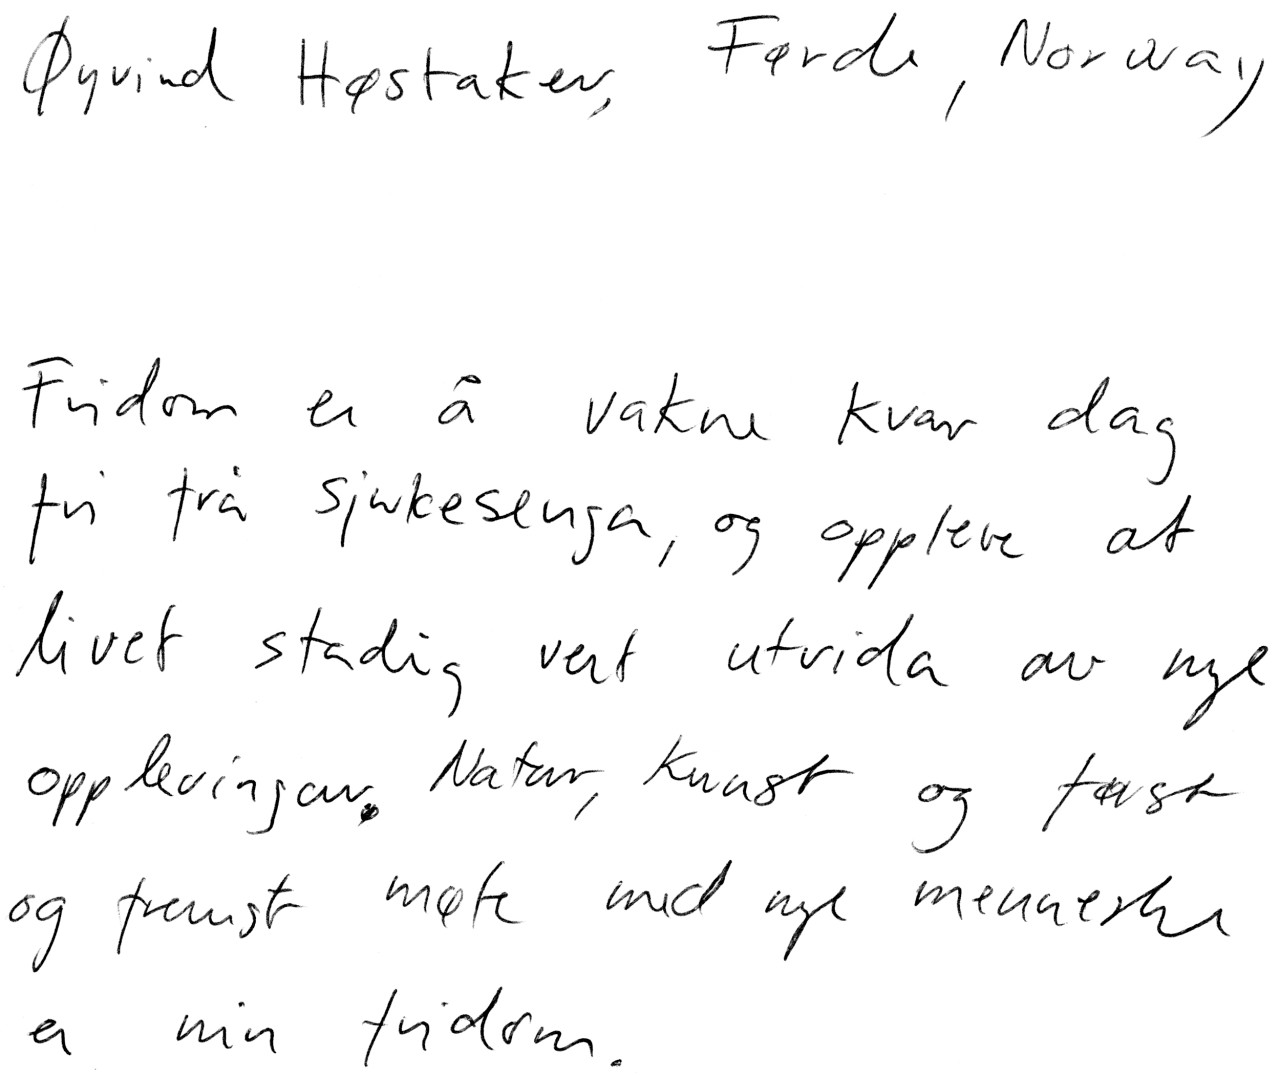 Øyvind Høstaker's definition of freedom - Tracing Freedom